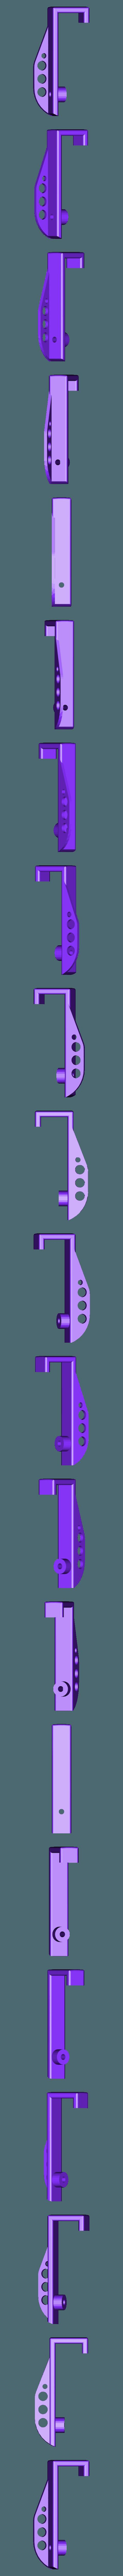 guide.stl Download STL file micro cord spool • 3D printable model, Cadfinger